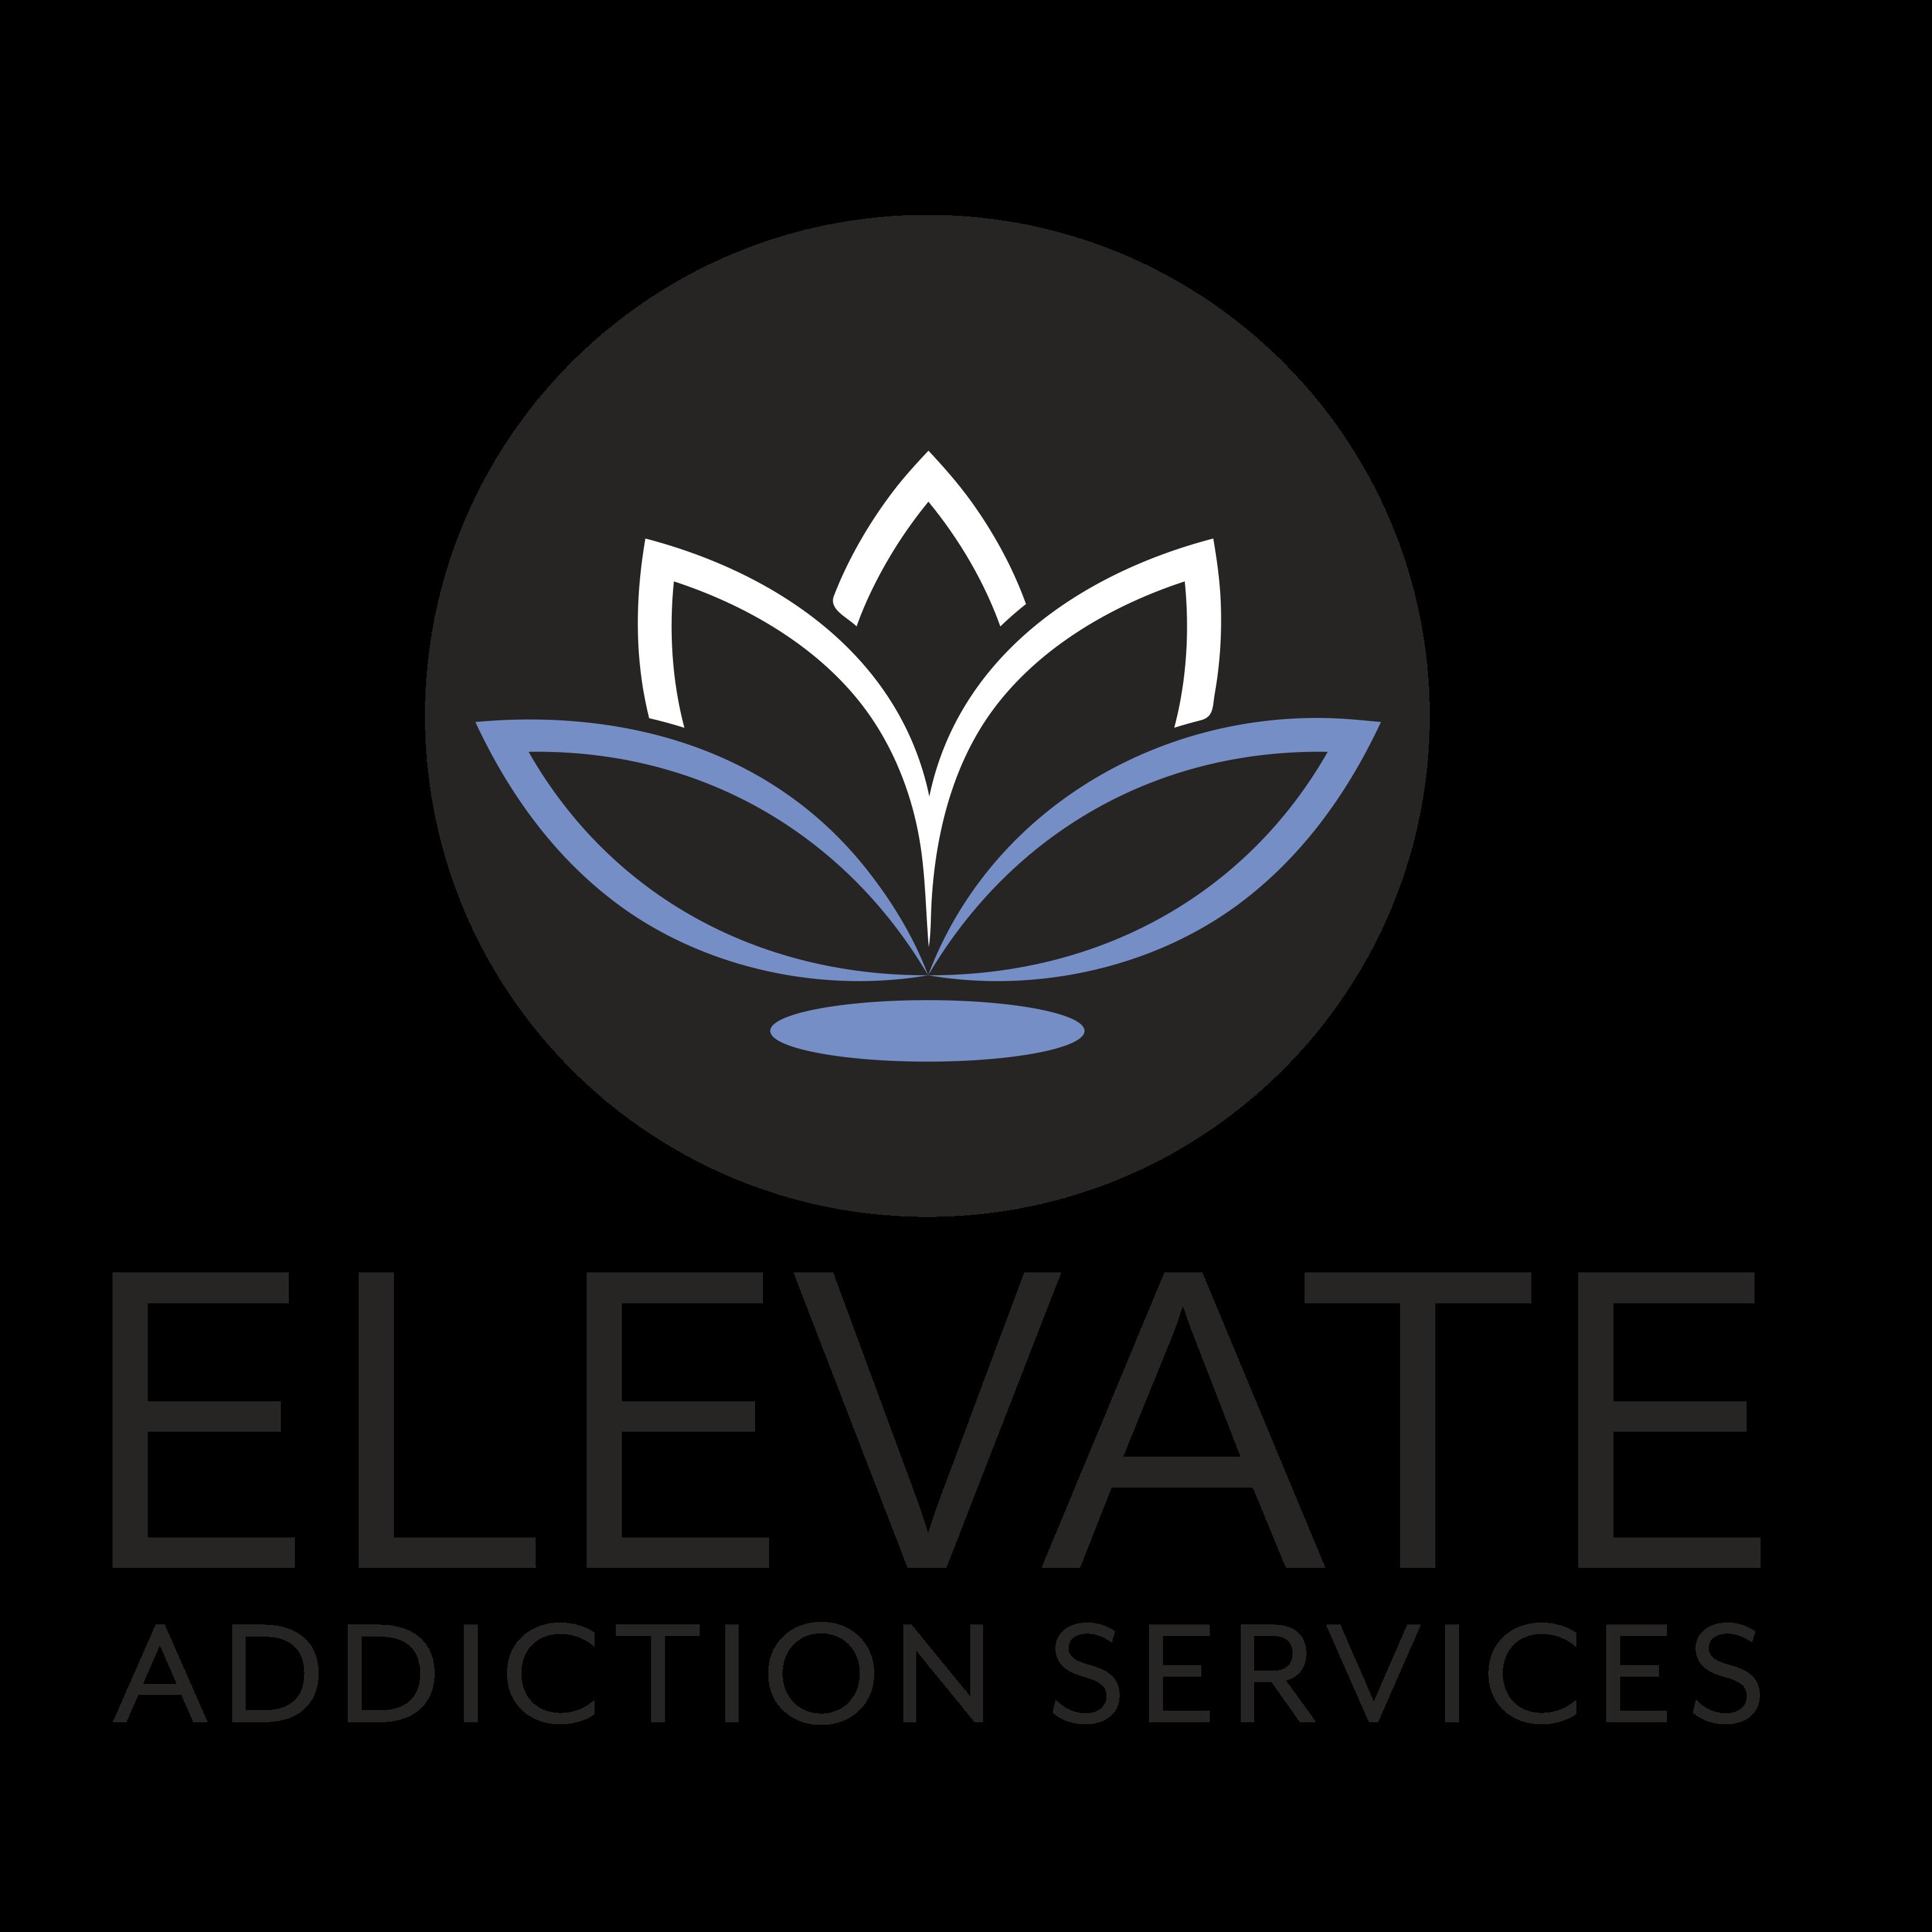 Elevate Addiction Services